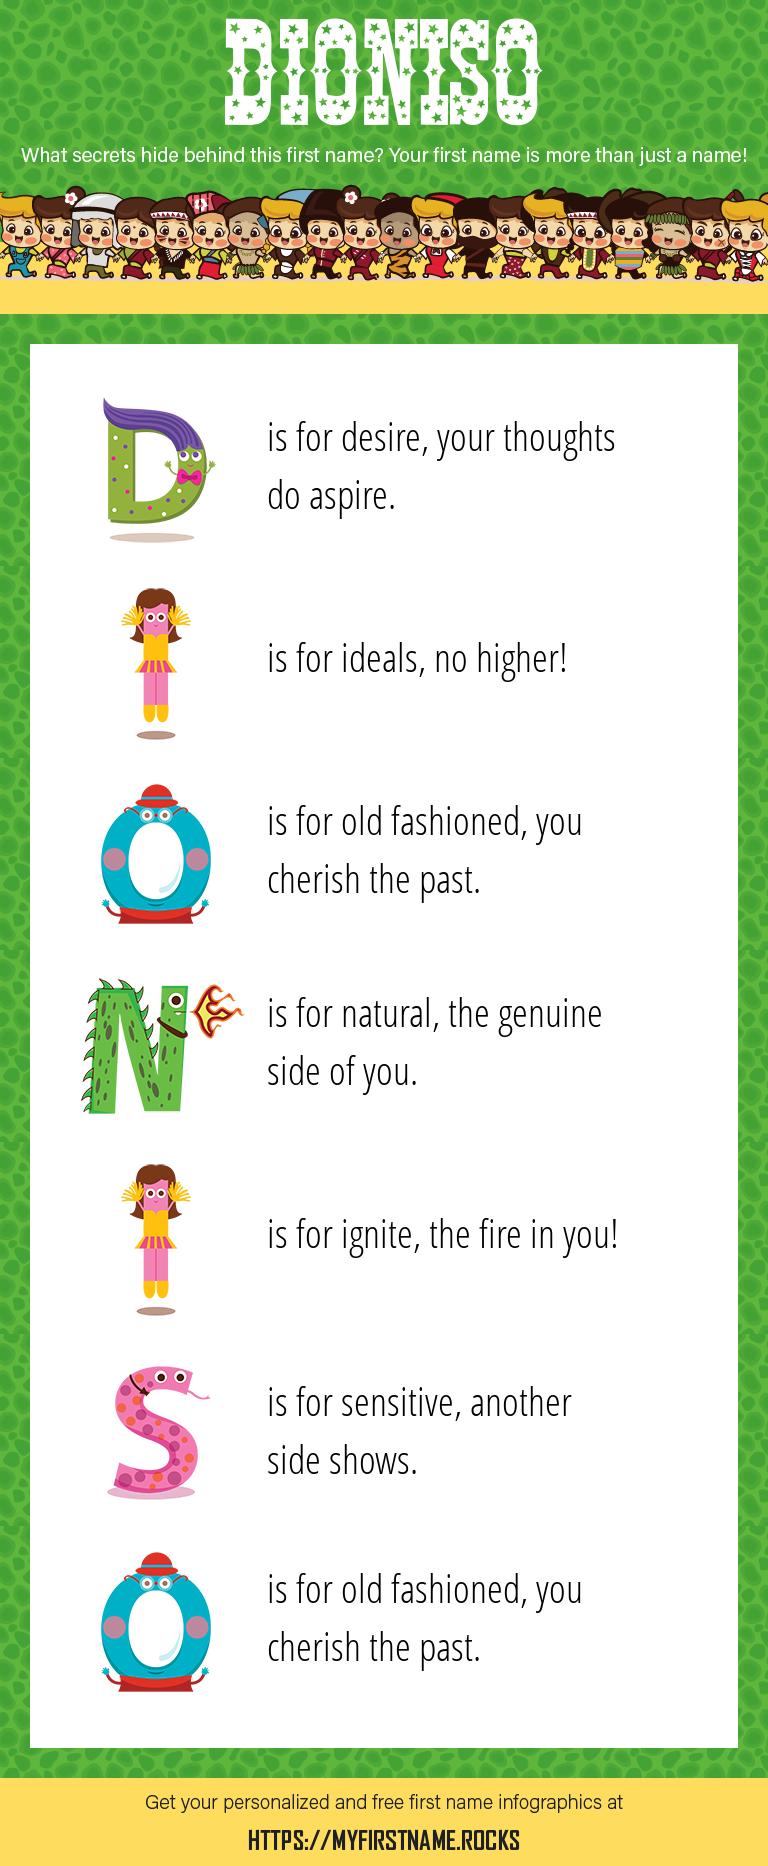 Dioniso Infographics